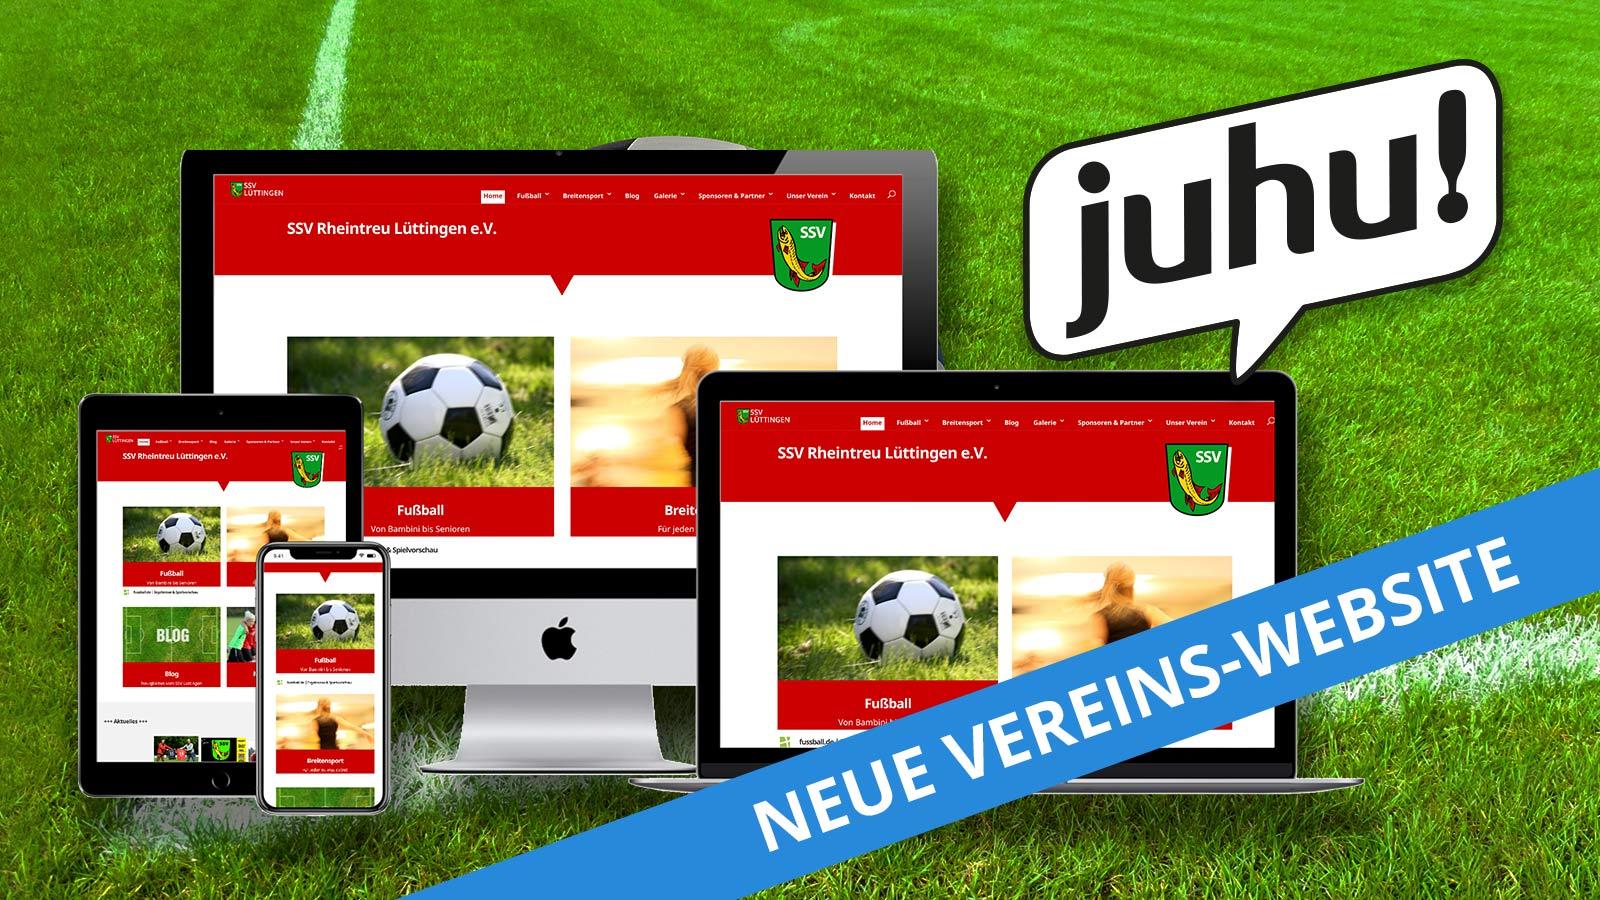 Vereinswebsite SSV Rheintreu Lüttingen e.V.